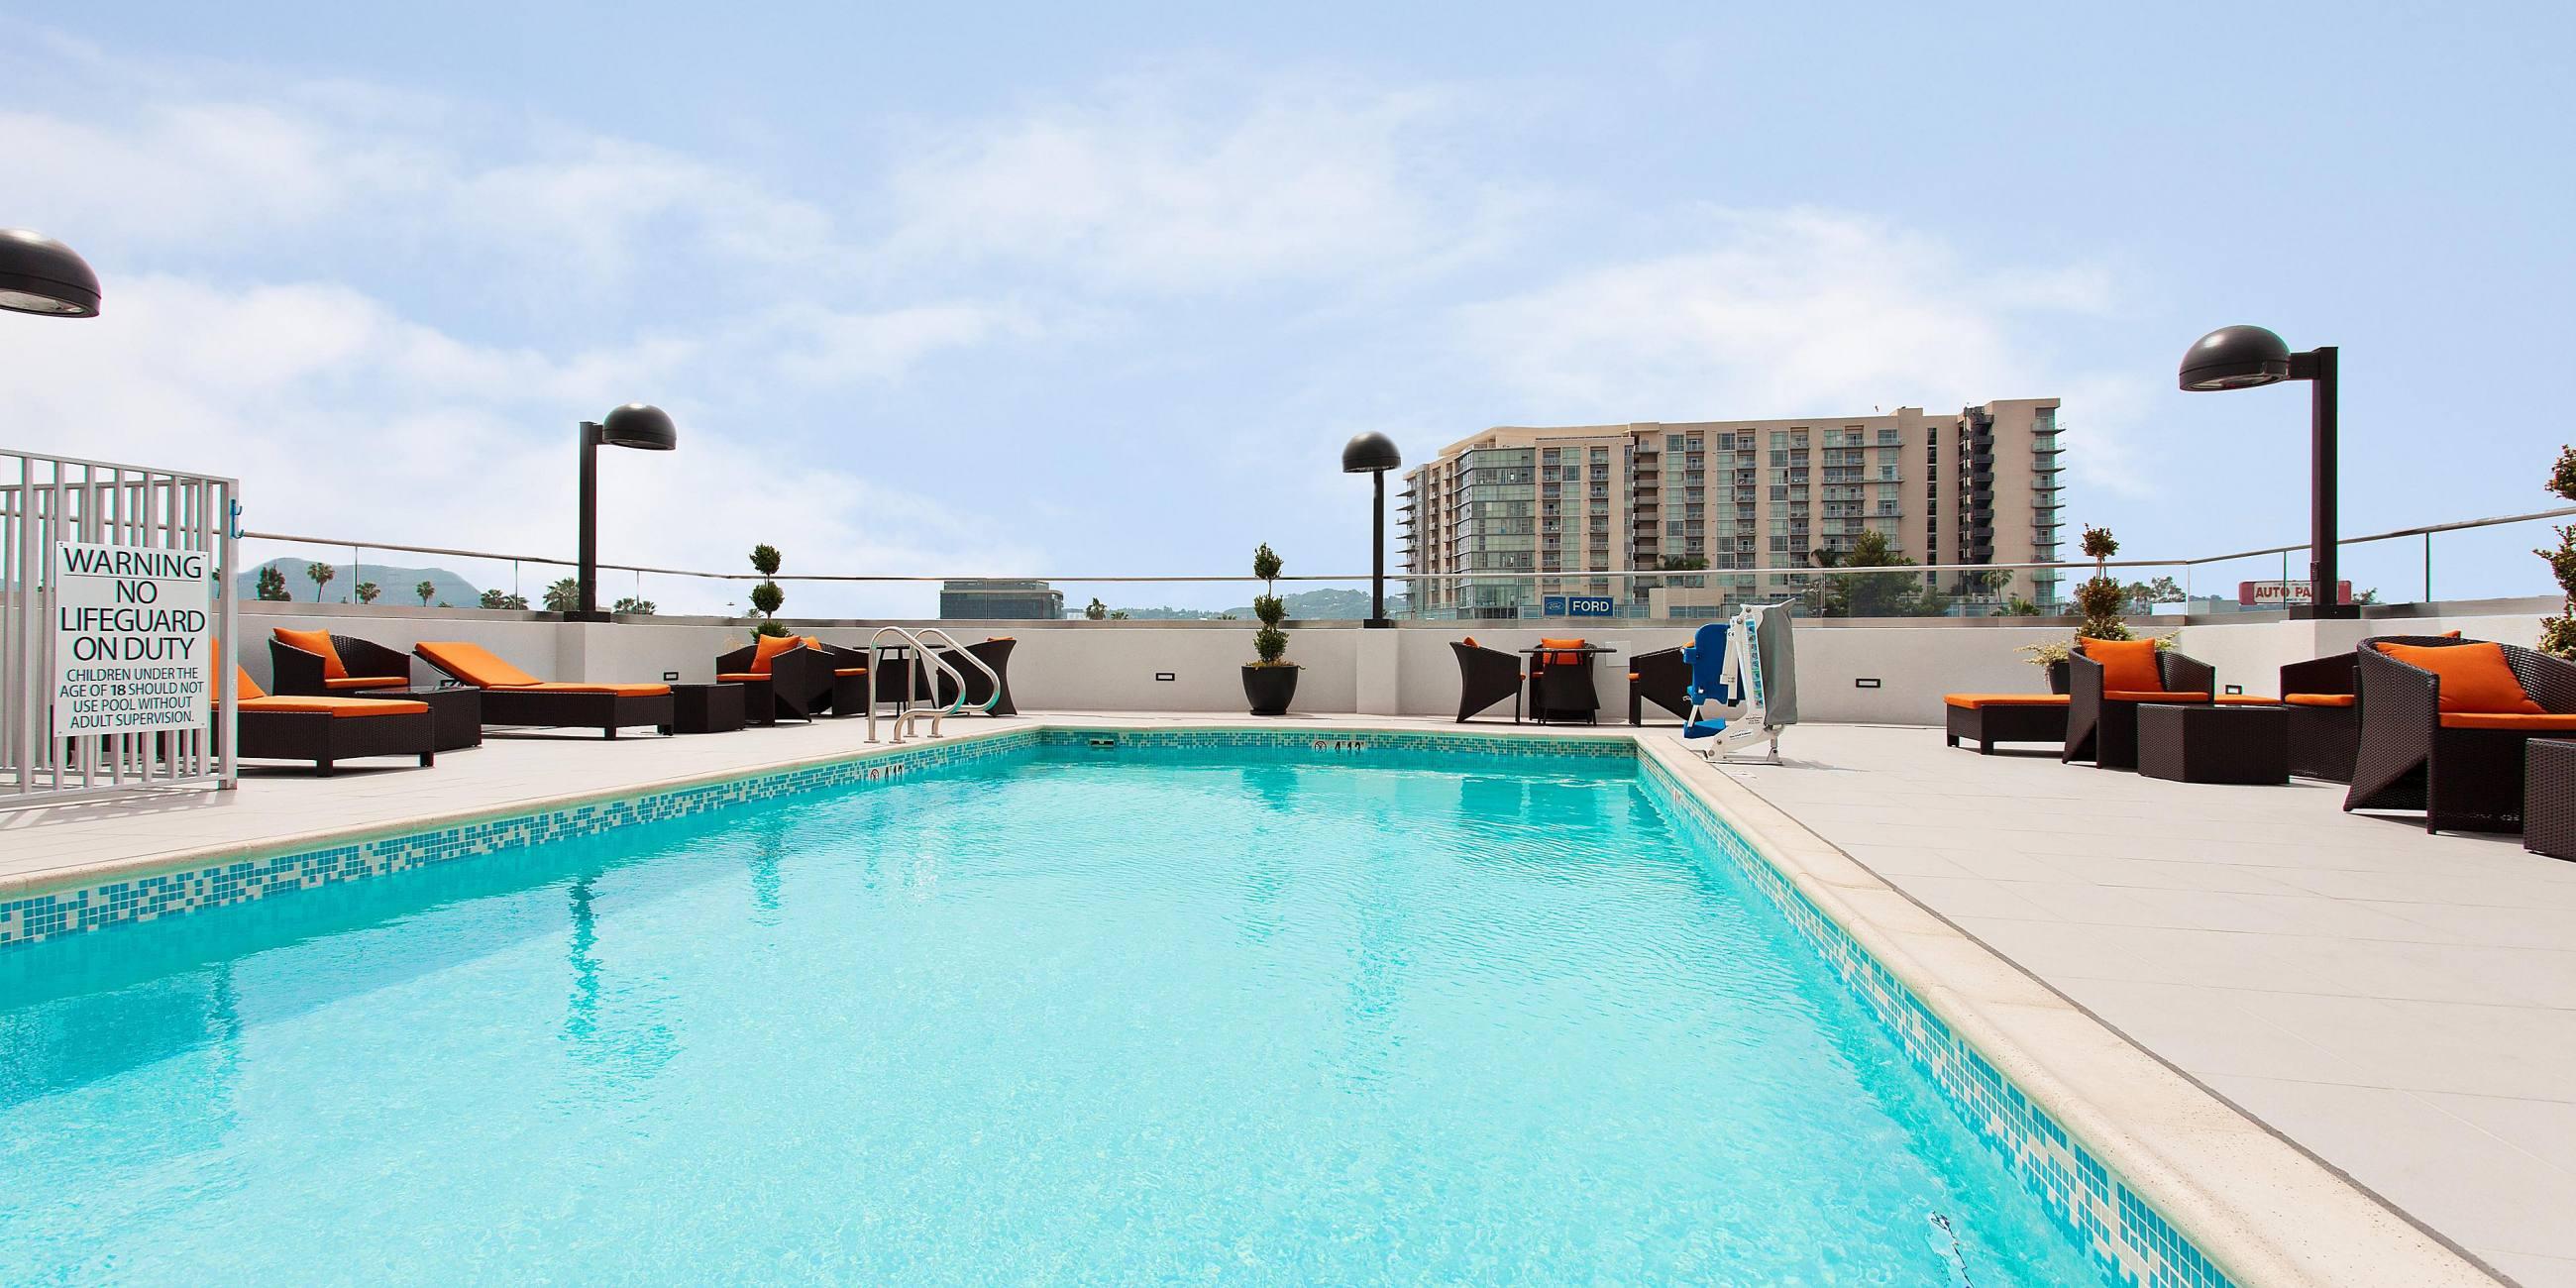 Rooftop pool at Holiday Inn Express North Hollywood - Burbank Area